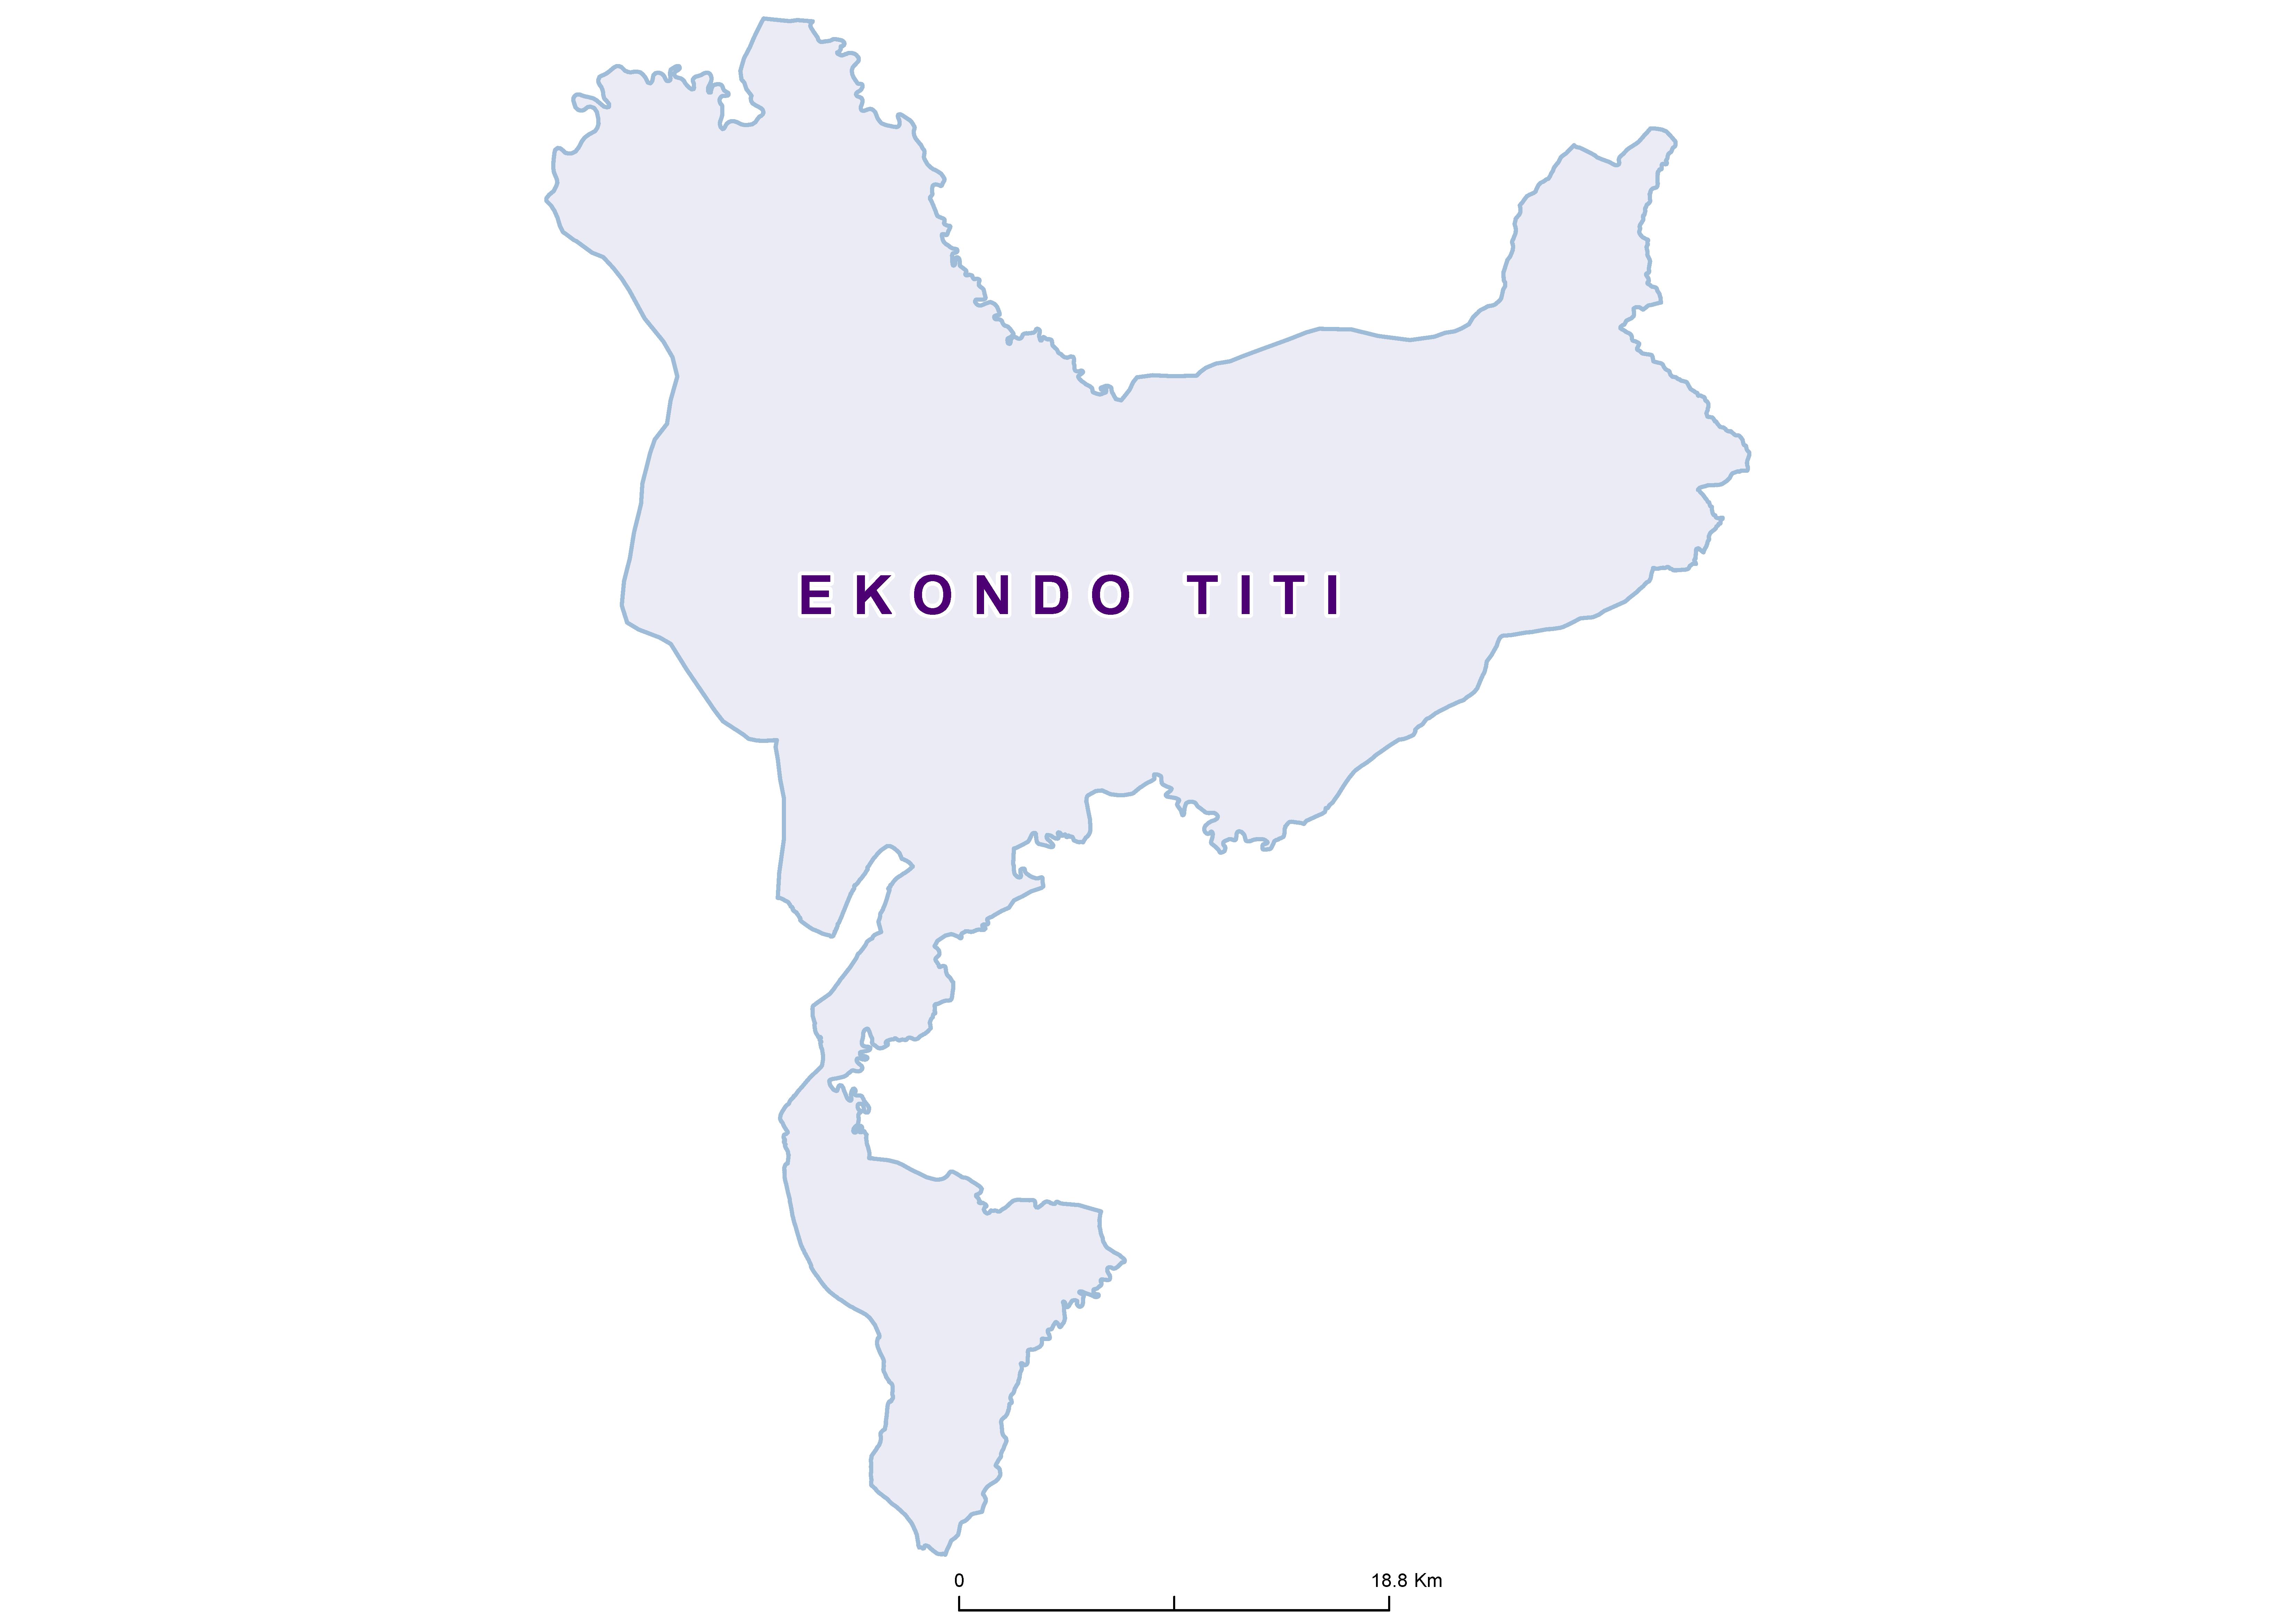 Ekondo titi Mean SCH 19850001